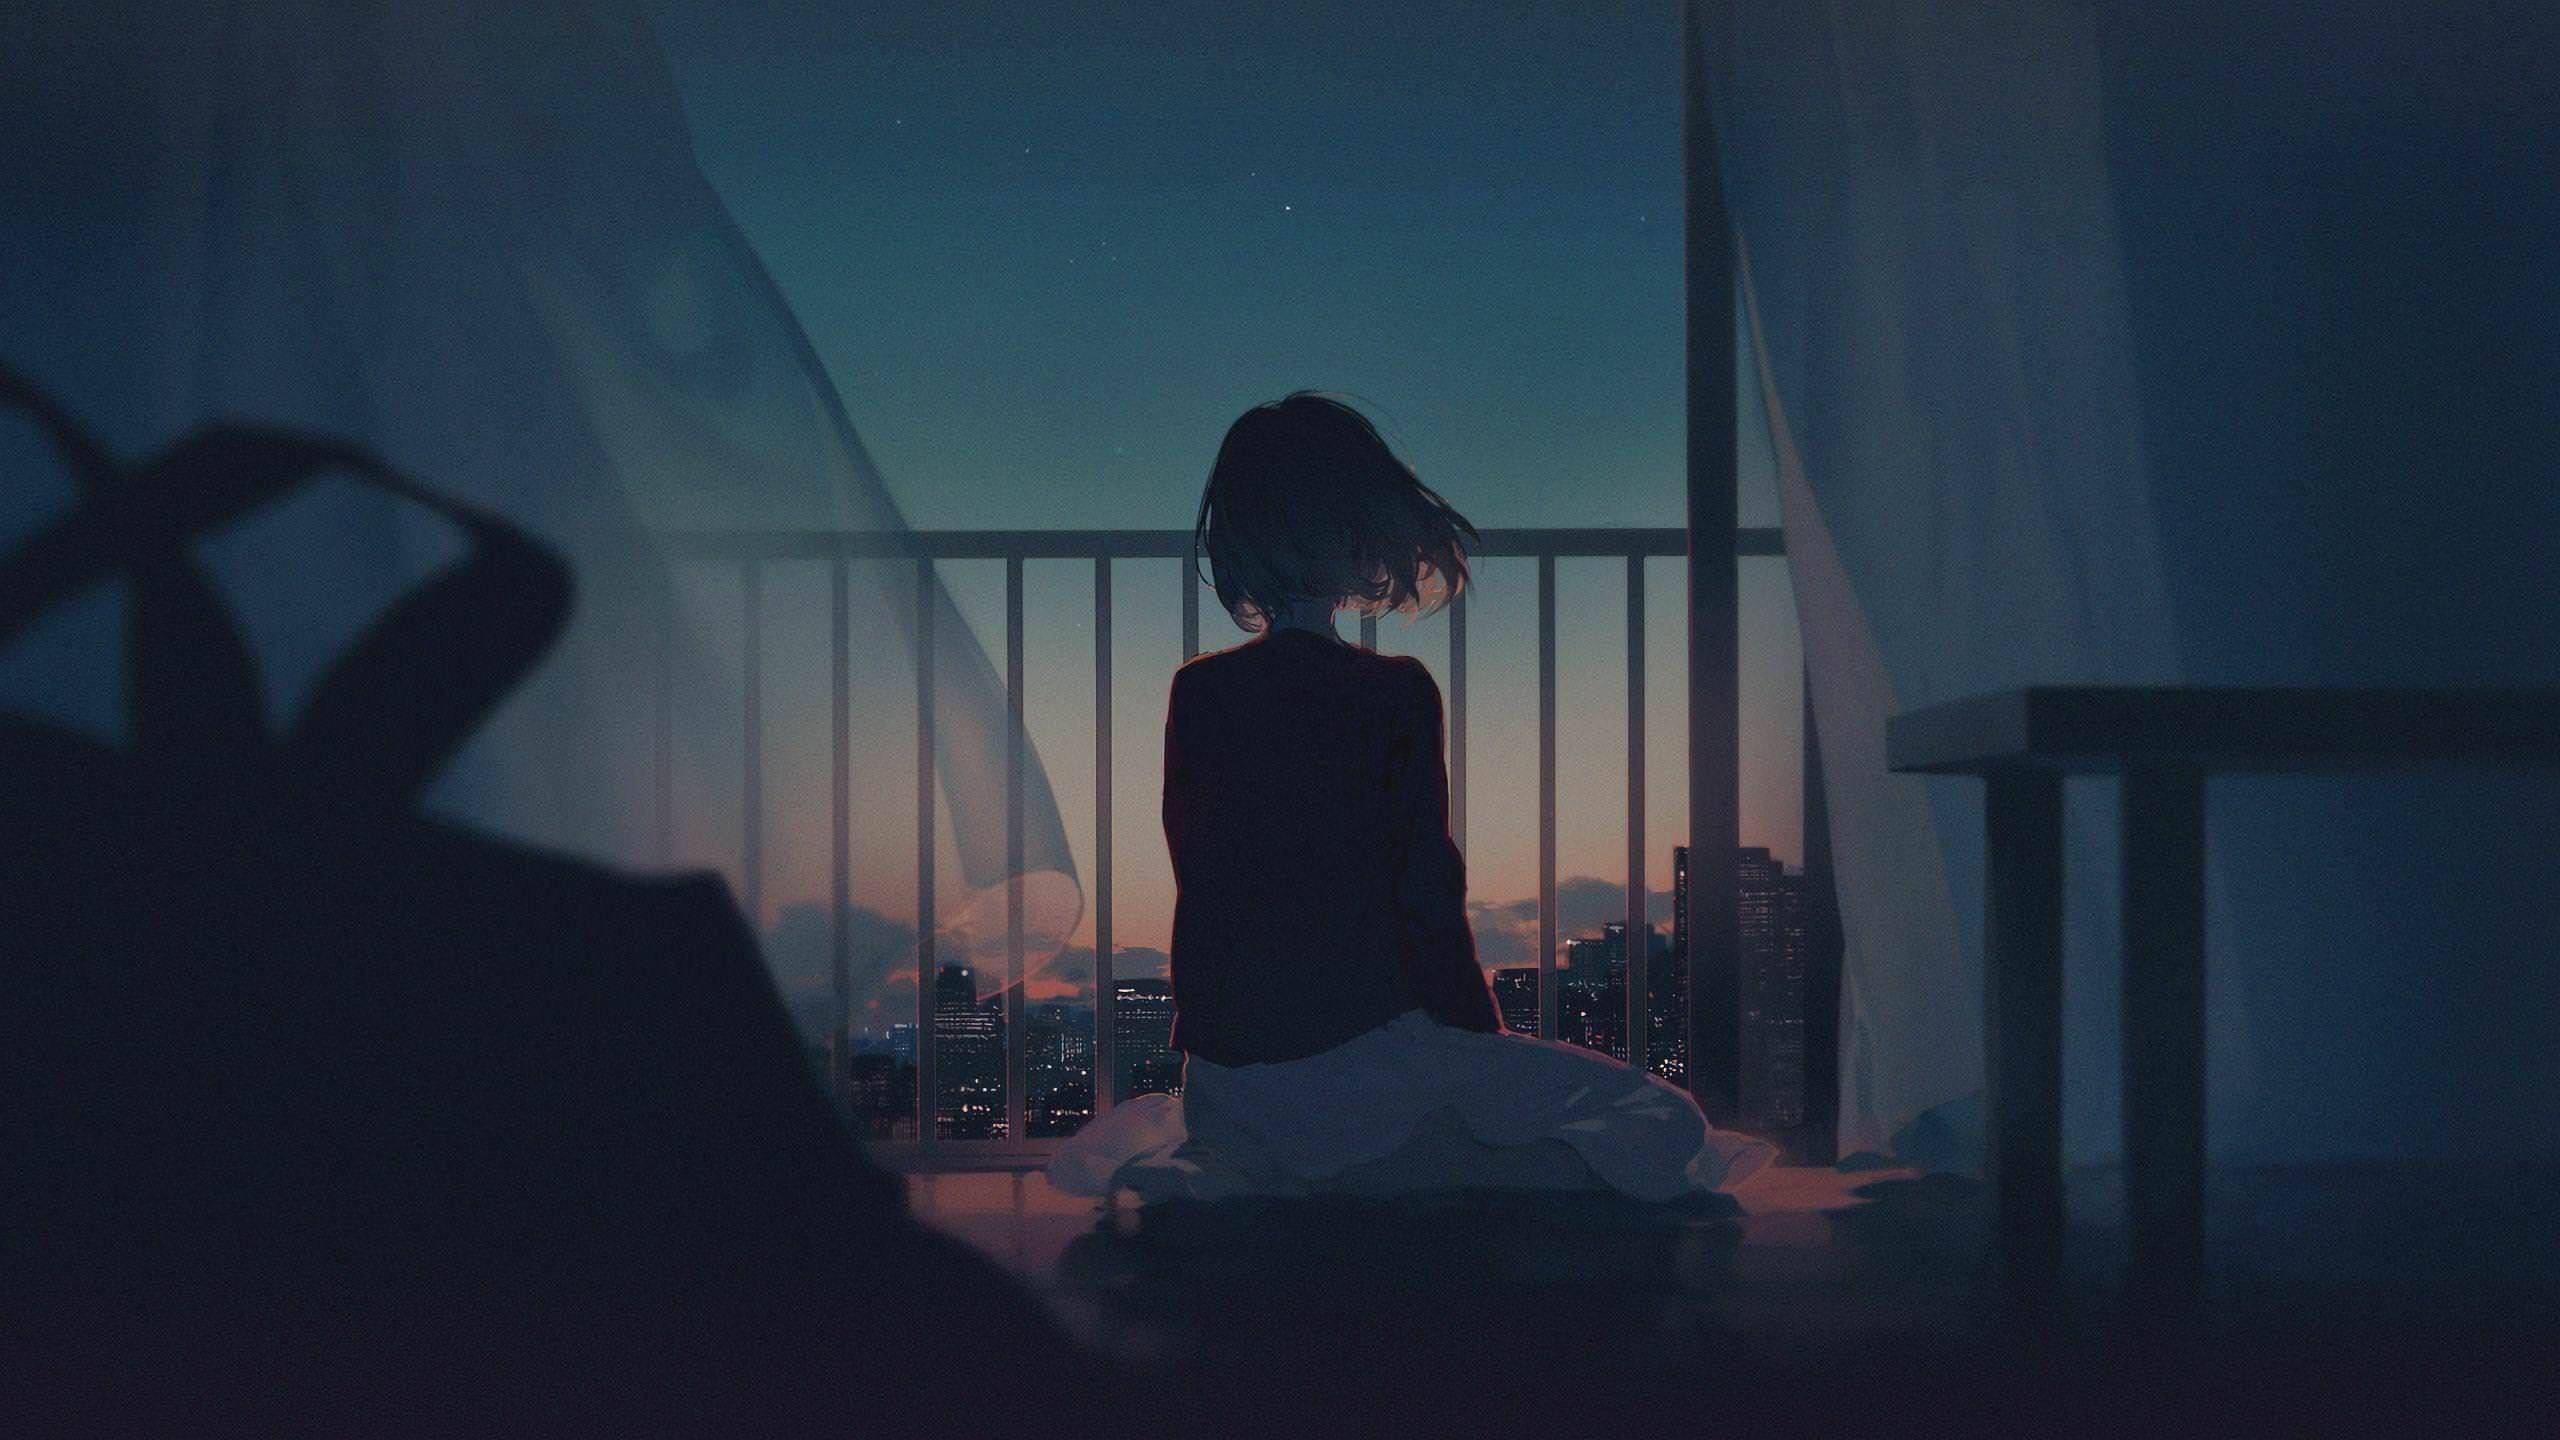 2560x1440 8rjni4t Like Lo Fi Wallpaper Resizr Co Anime Wallpaper 1920x1080 Alone Girl Anime Background